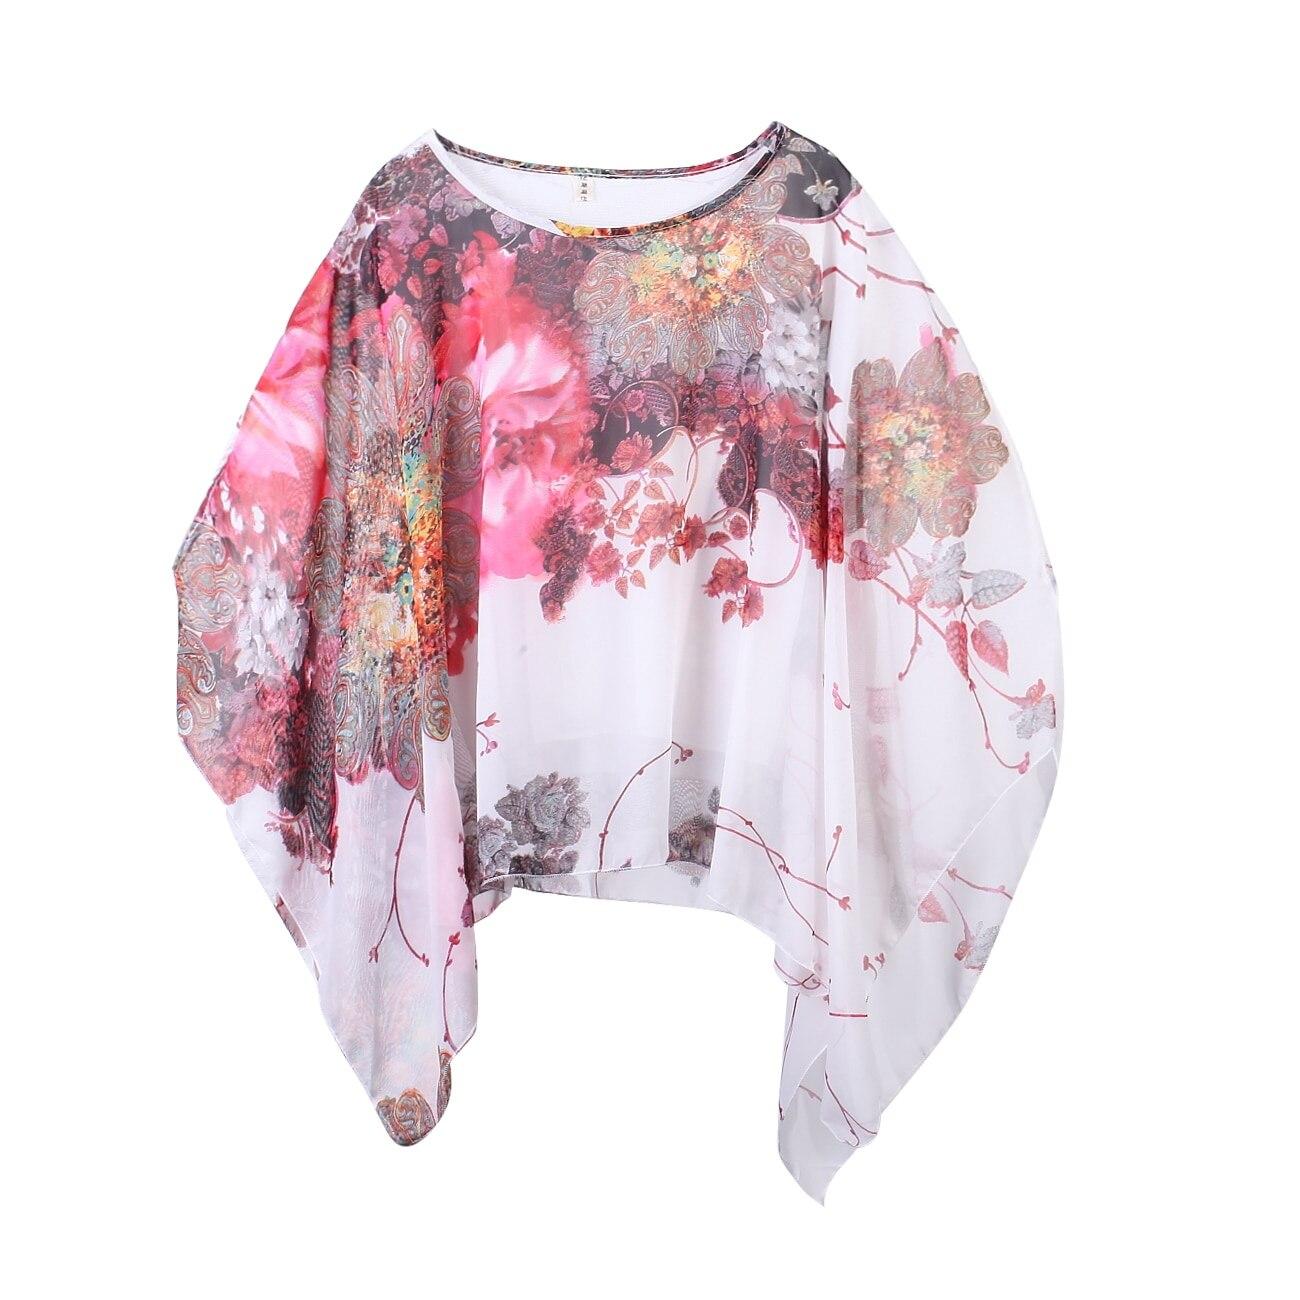 Blusa Sexy bohemia de manga de murciélago suelta para mujer, blusa informal de gasa, camiseta blusa Ponchos